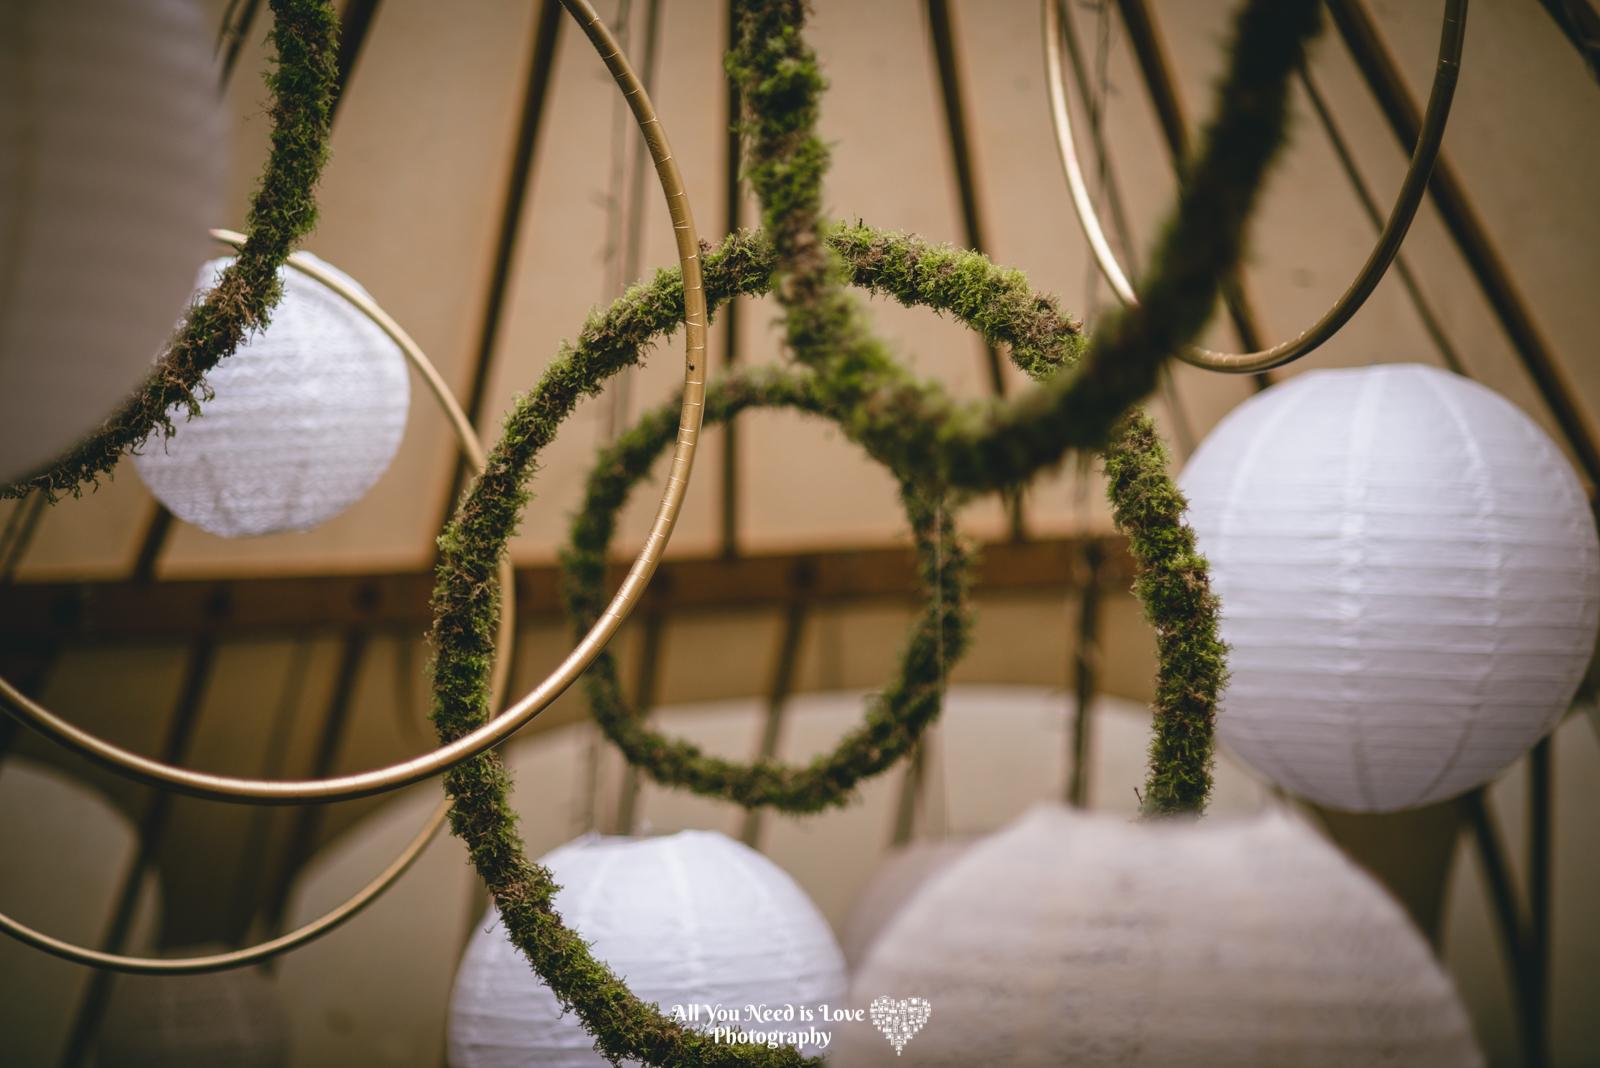 Yurt wedding decorations